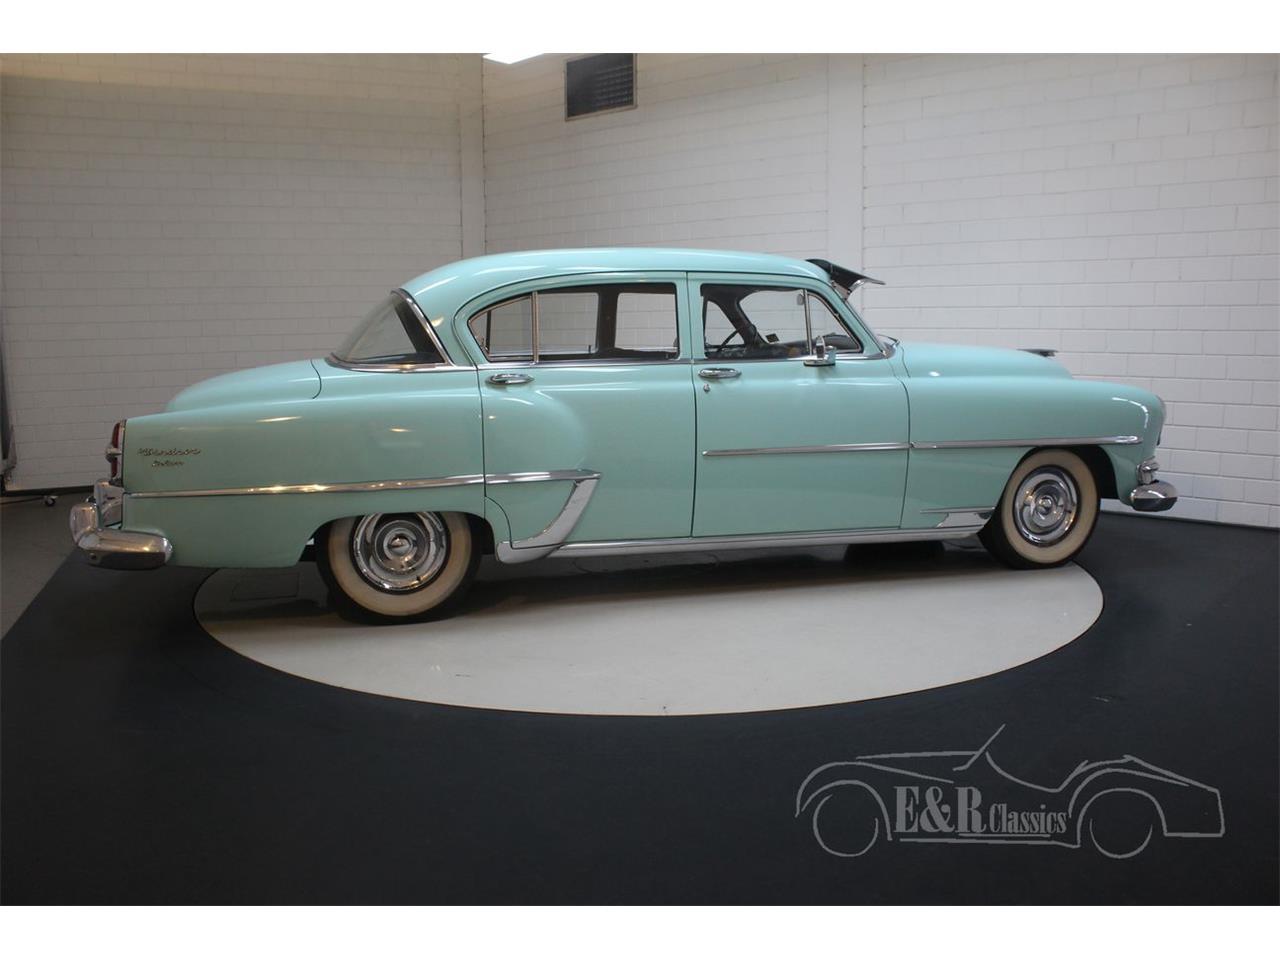 Large Picture of '54 Chrysler Windsor - $19,000.00 - QJZL